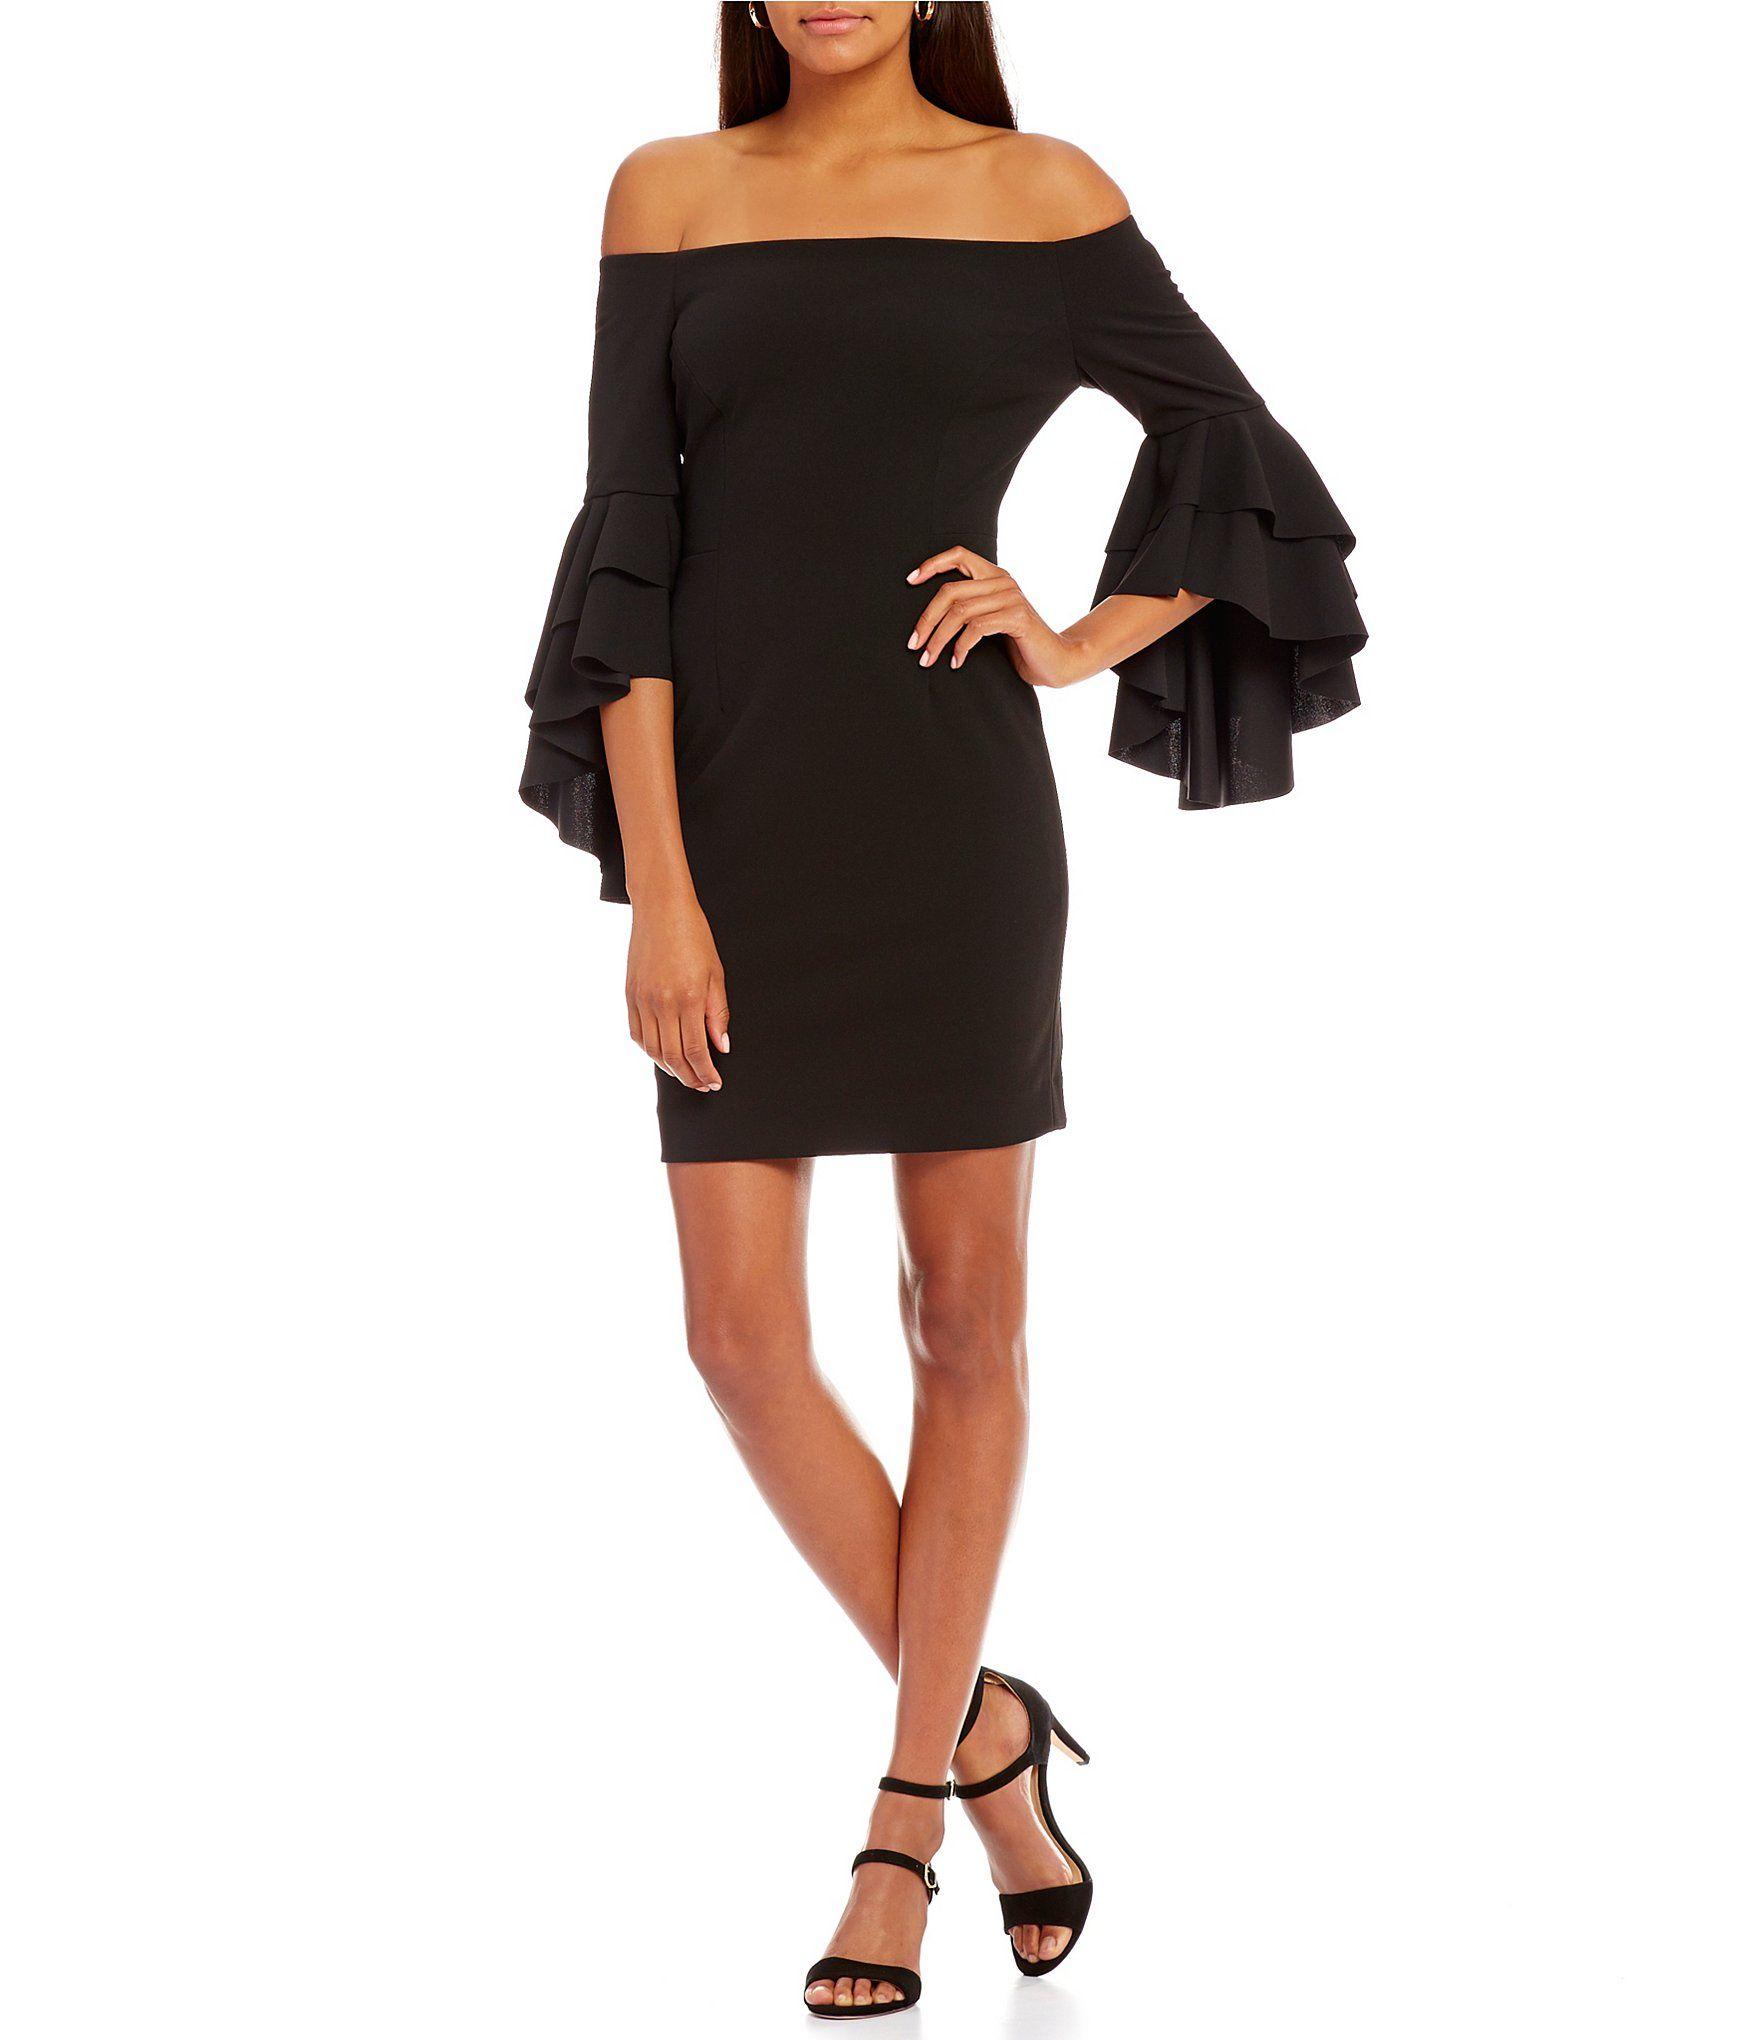 Dillards long sleeve black dresses